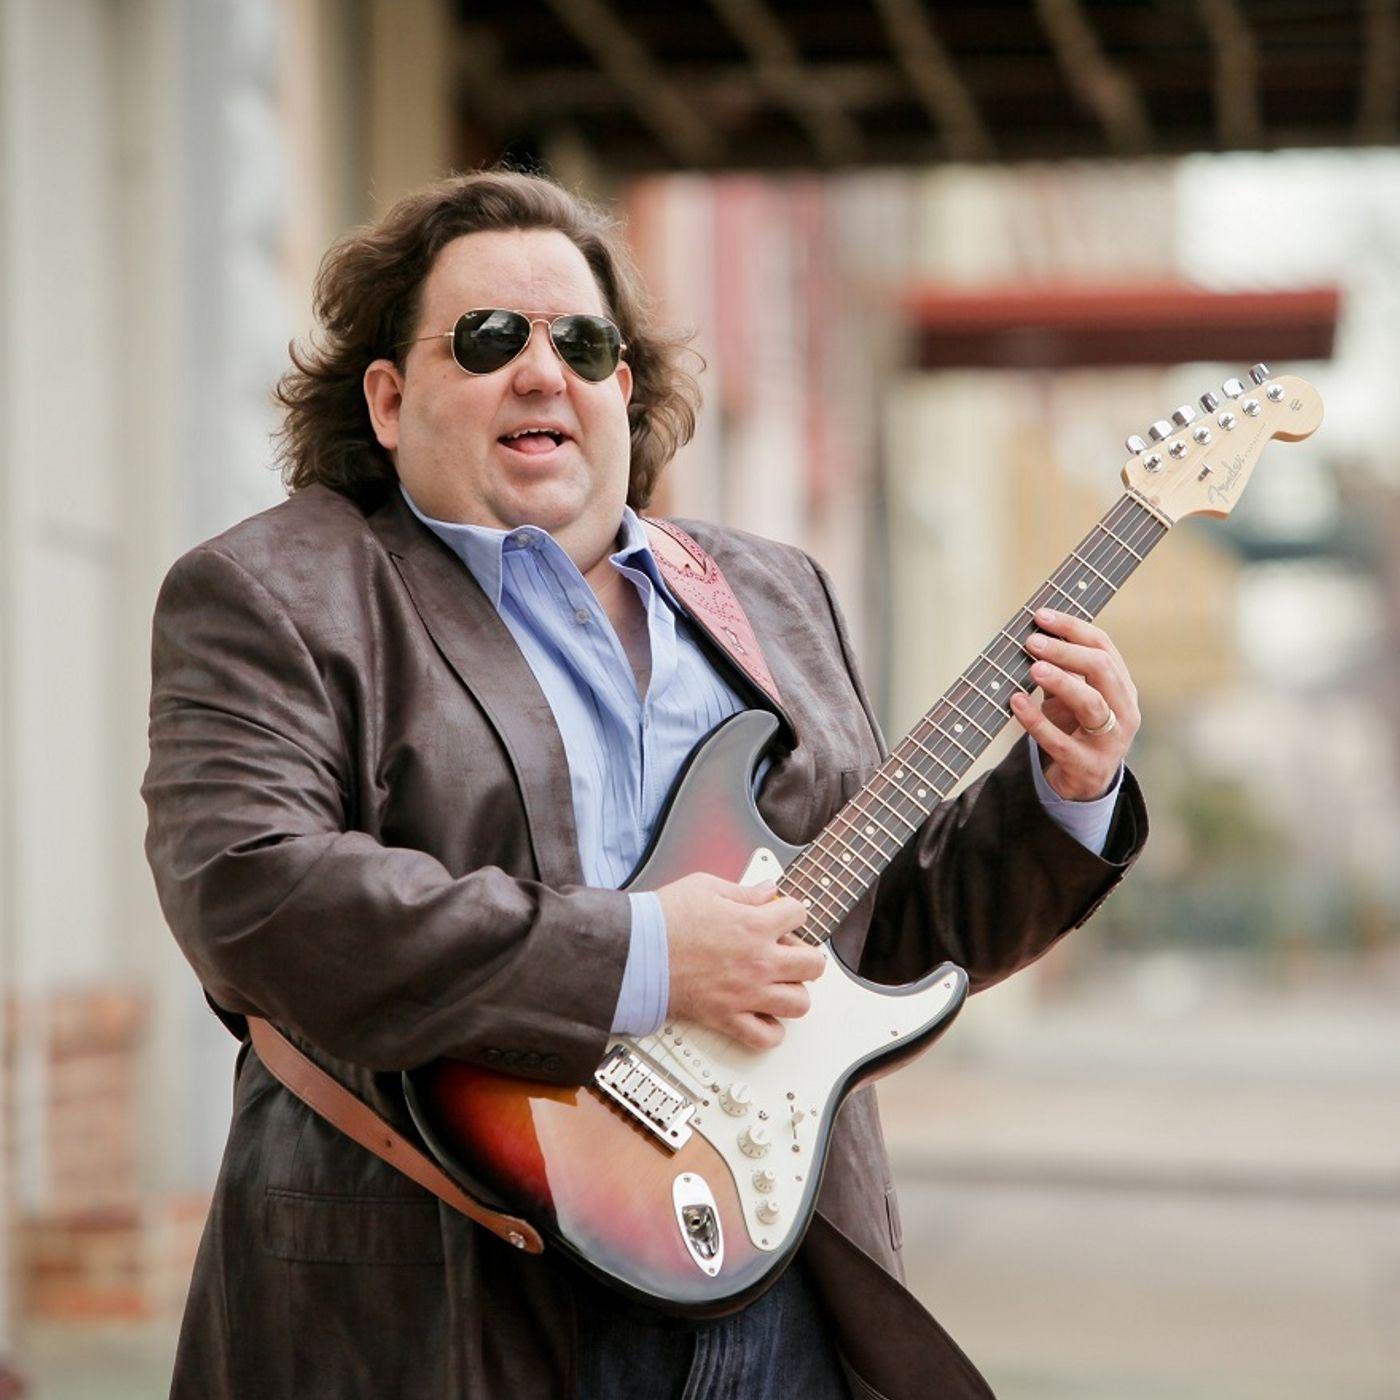 Blind Man Drivin' - Guitarist Joey Stuckey on Big Blend Radio